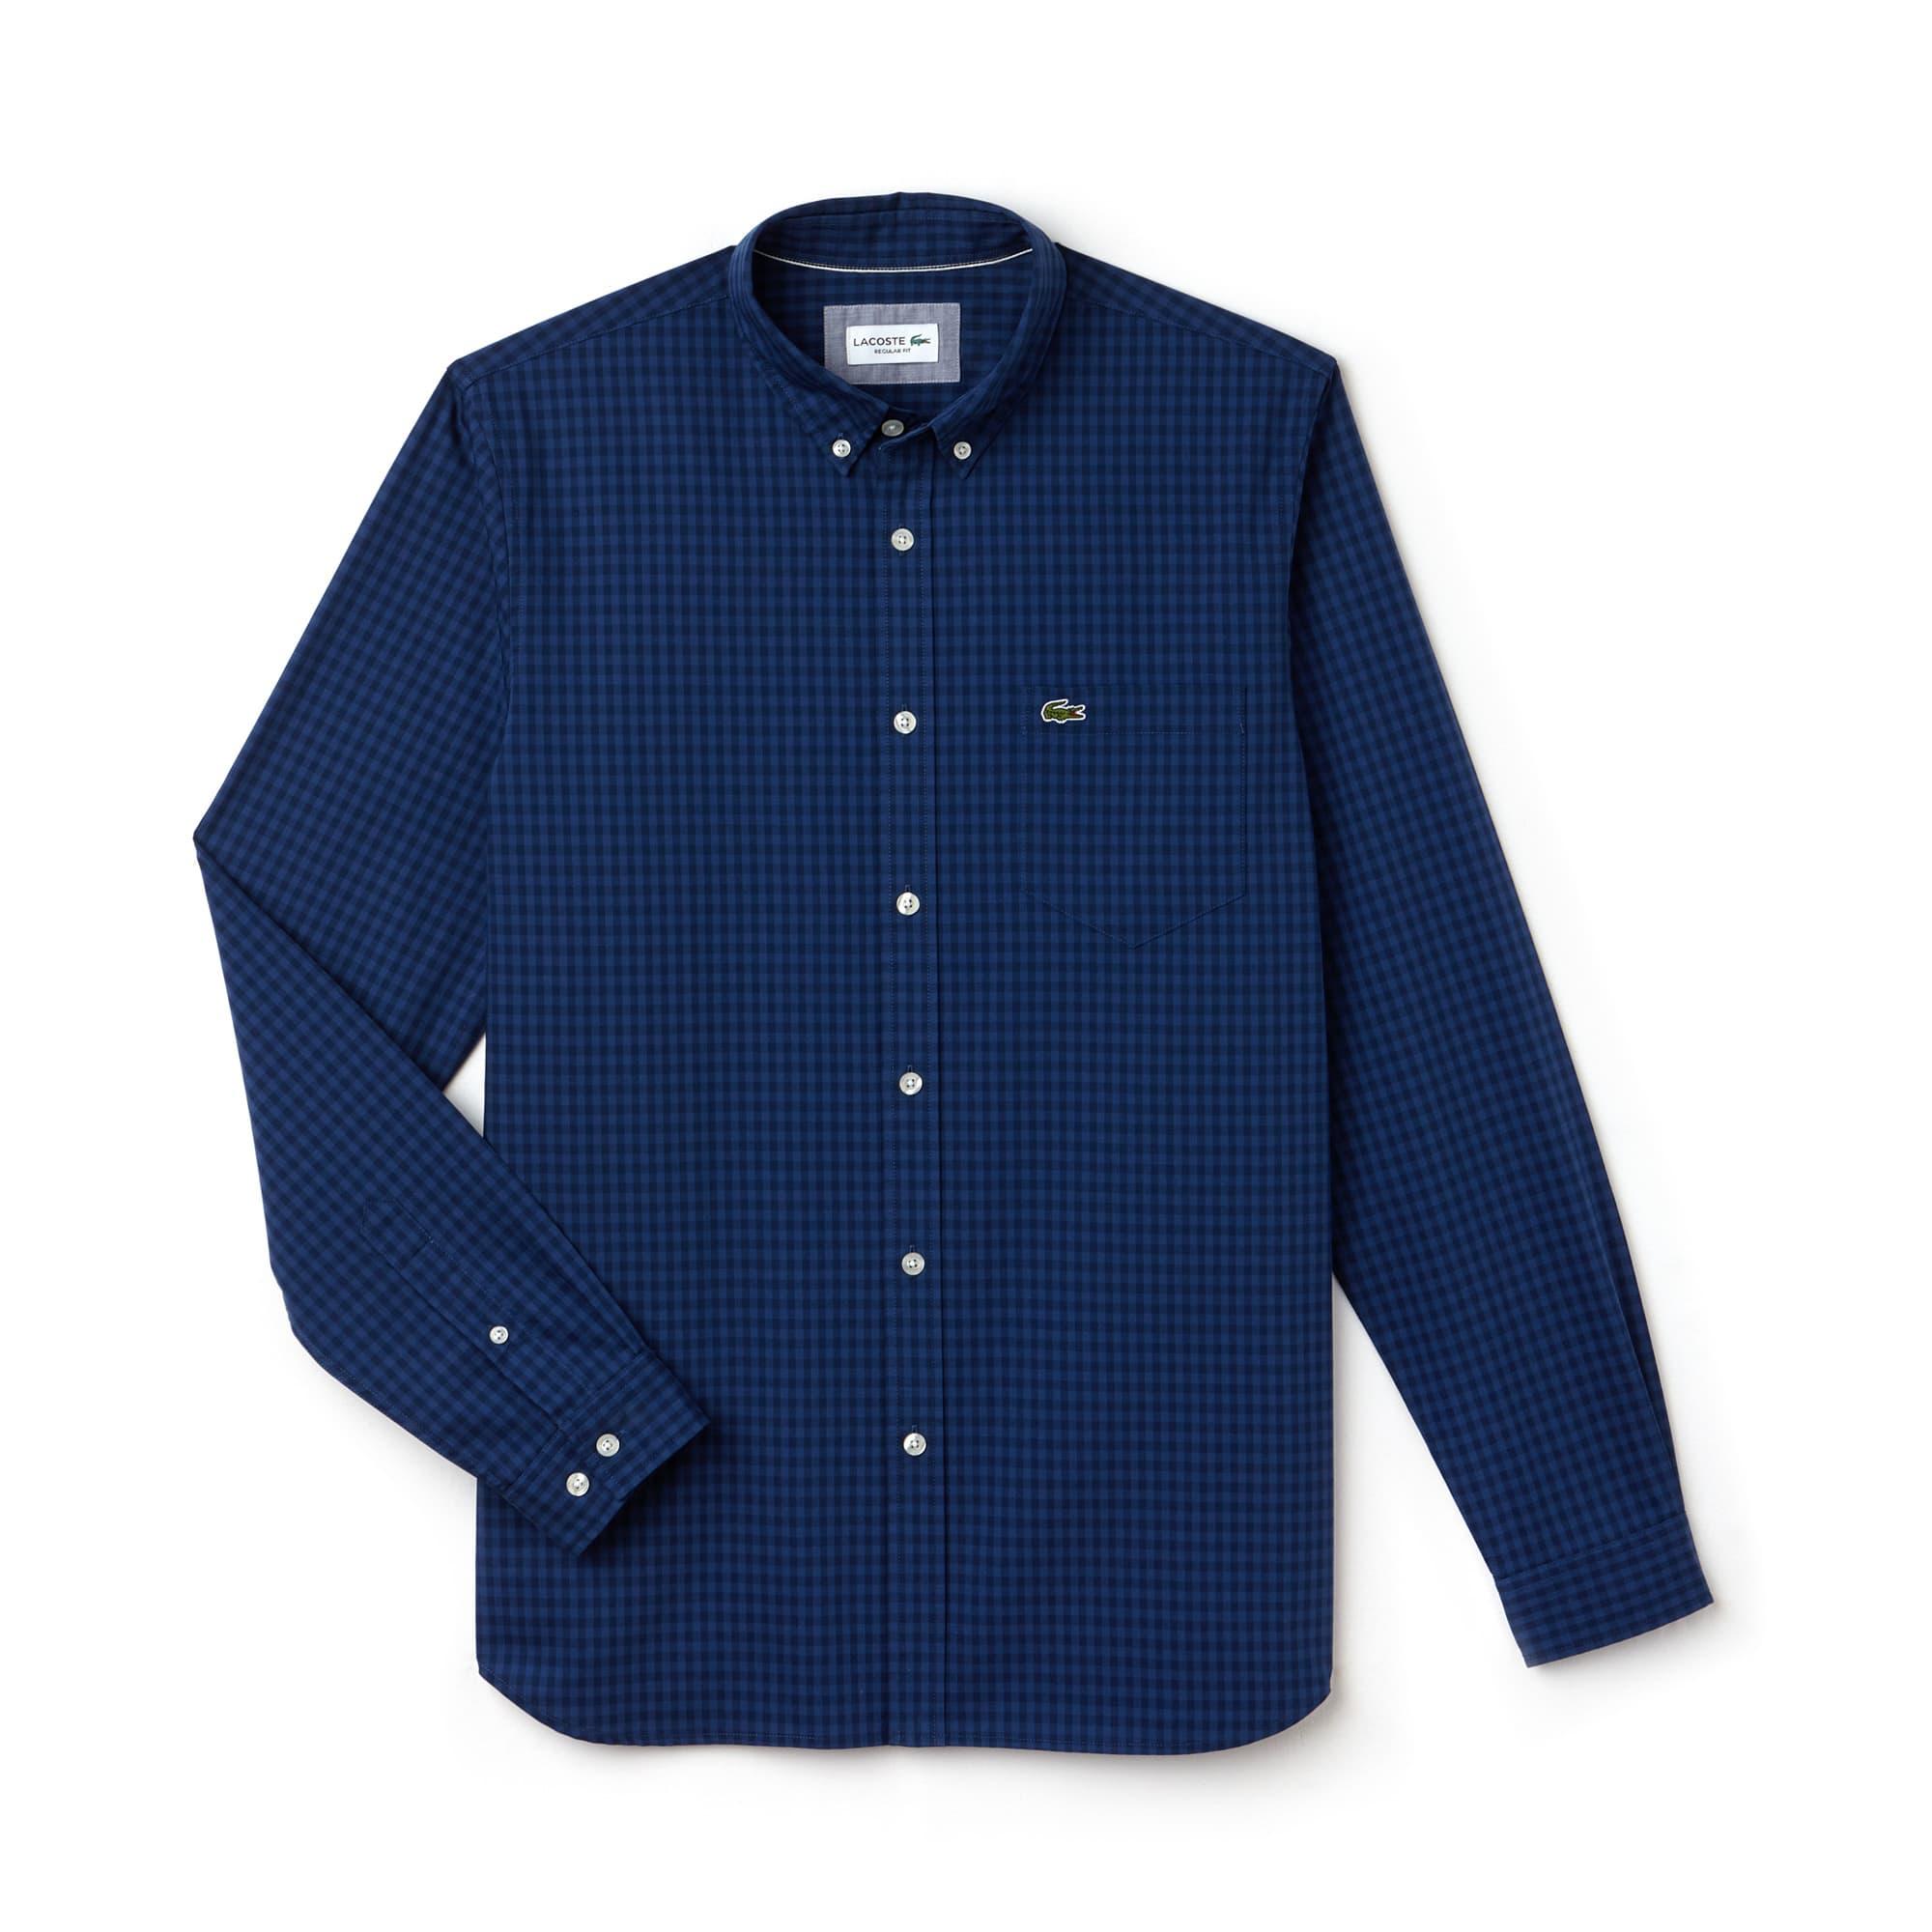 Regular Fit Herren-Hemd aus Baumwoll-Popeline mit Karomuster